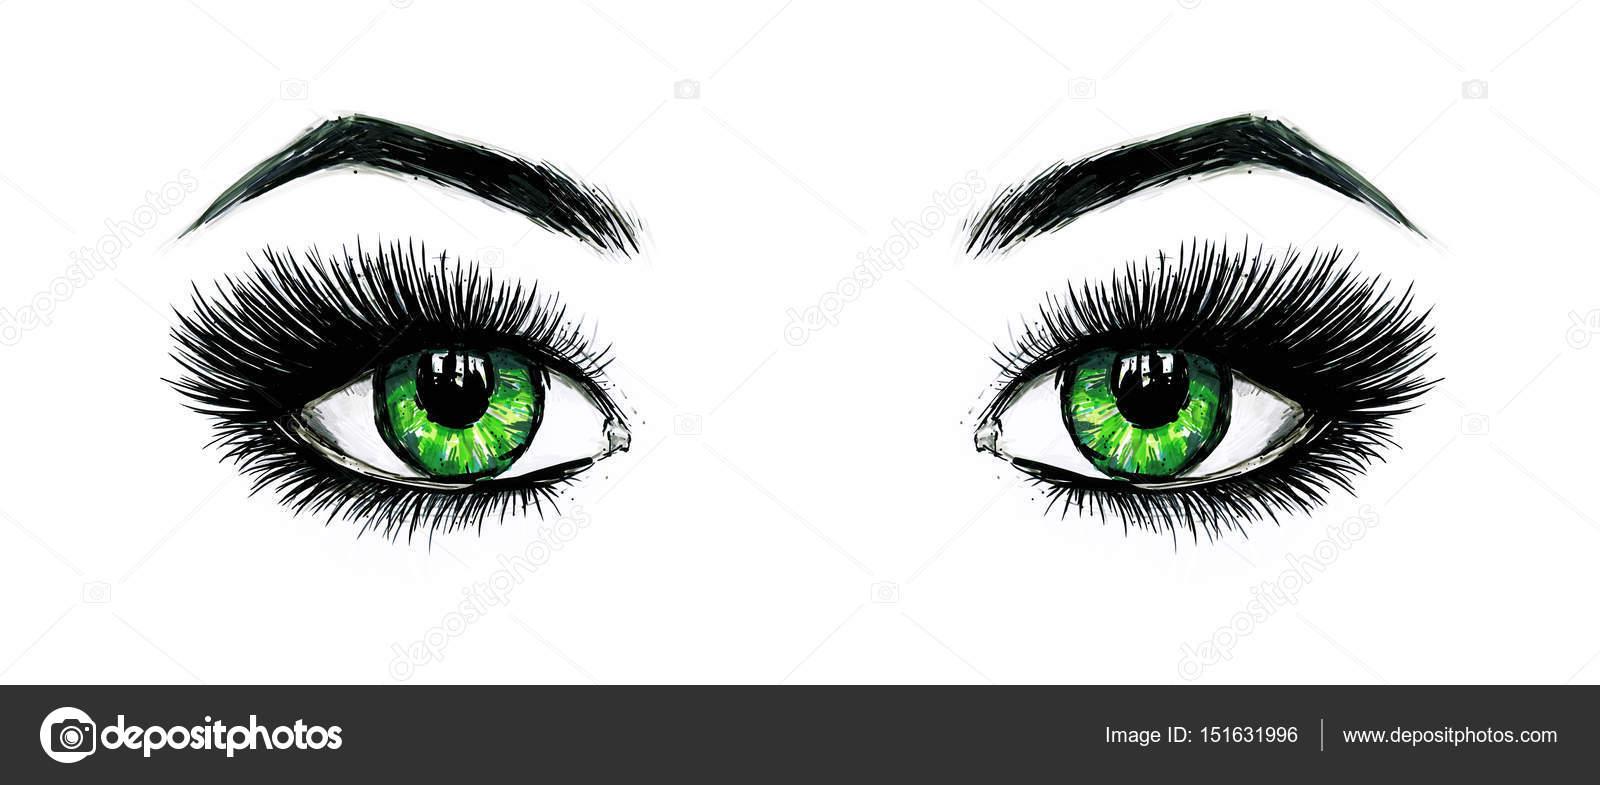 Beauty Room Ideas Belos Olhos Verdes Femininos Abertos Com C 237 Lios Longos 233